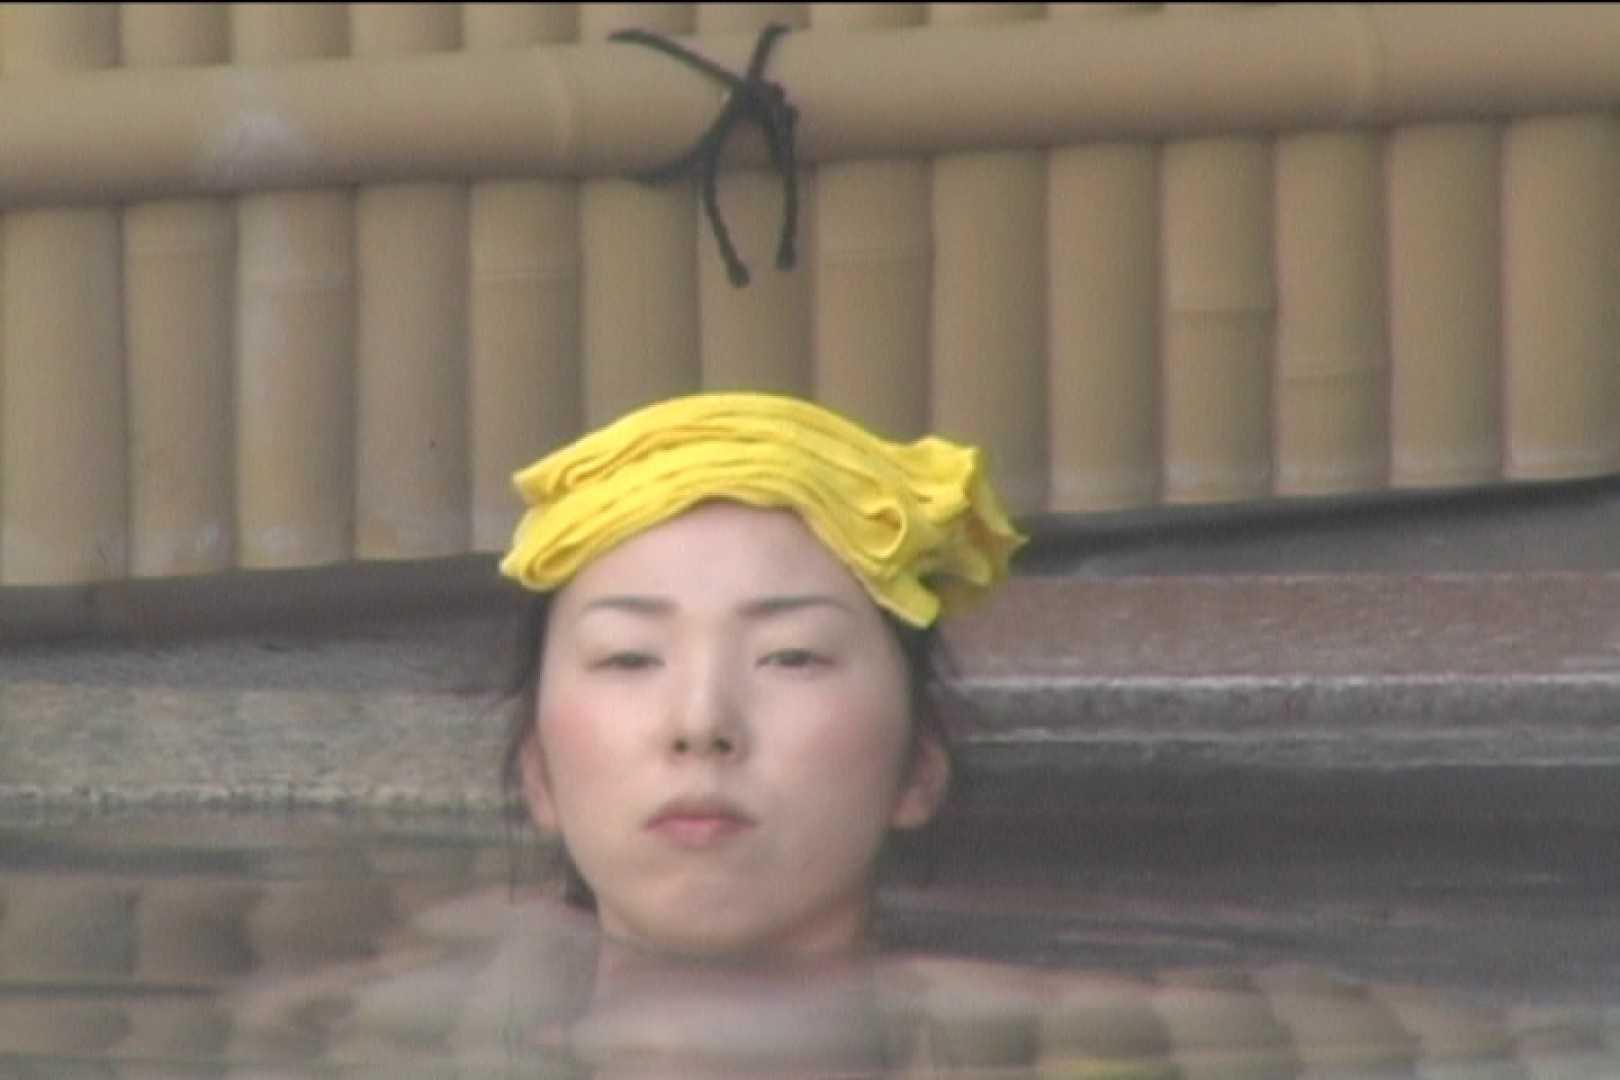 Aquaな露天風呂Vol.529 盗撮シリーズ | 露天風呂編  106PIX 19